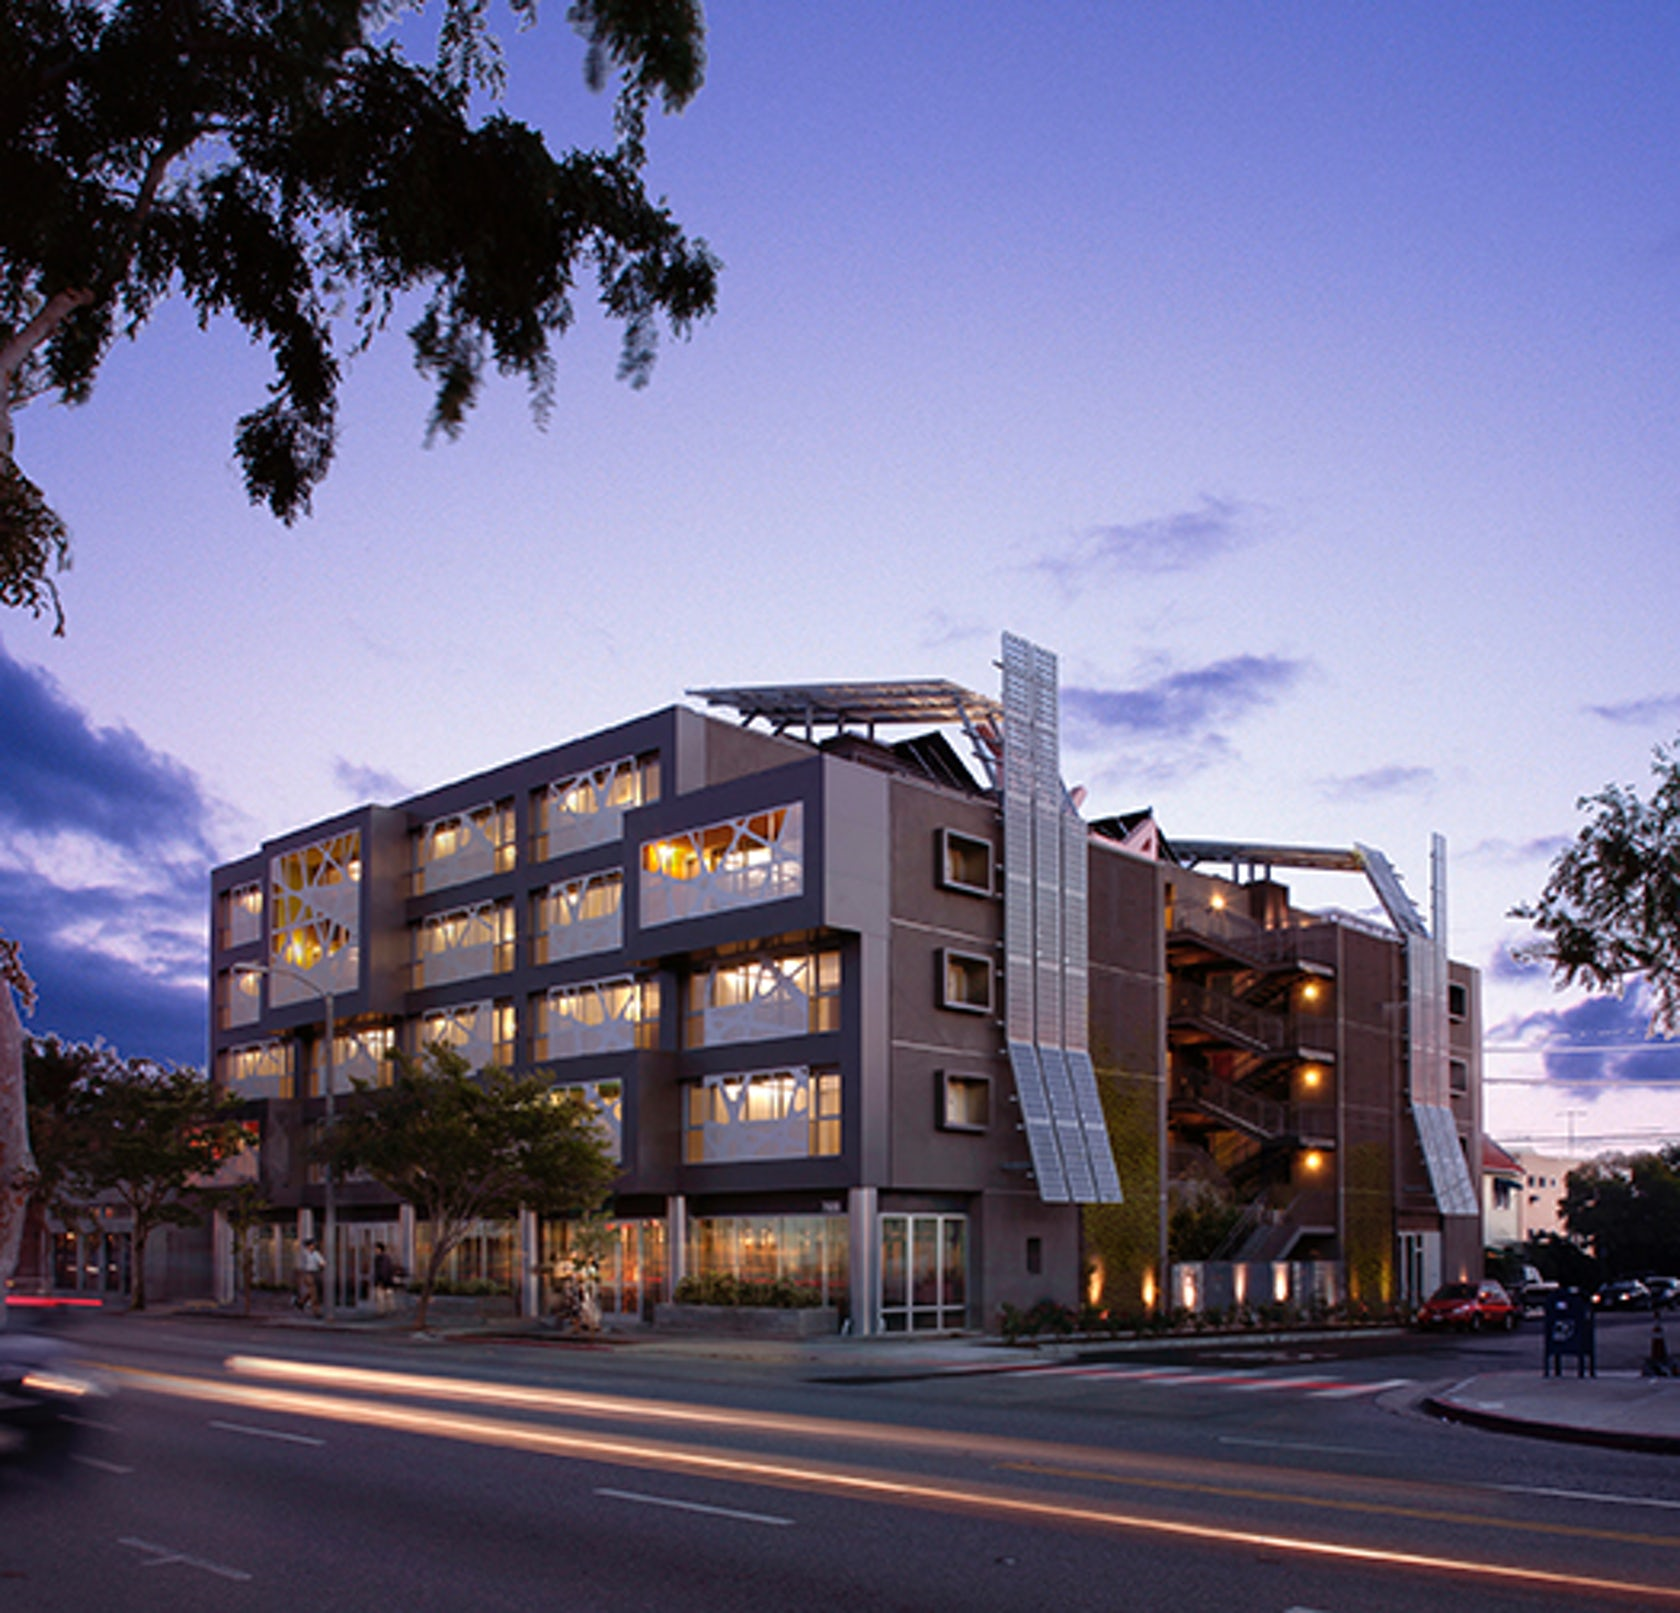 Sierra Bonita Affordable Housing